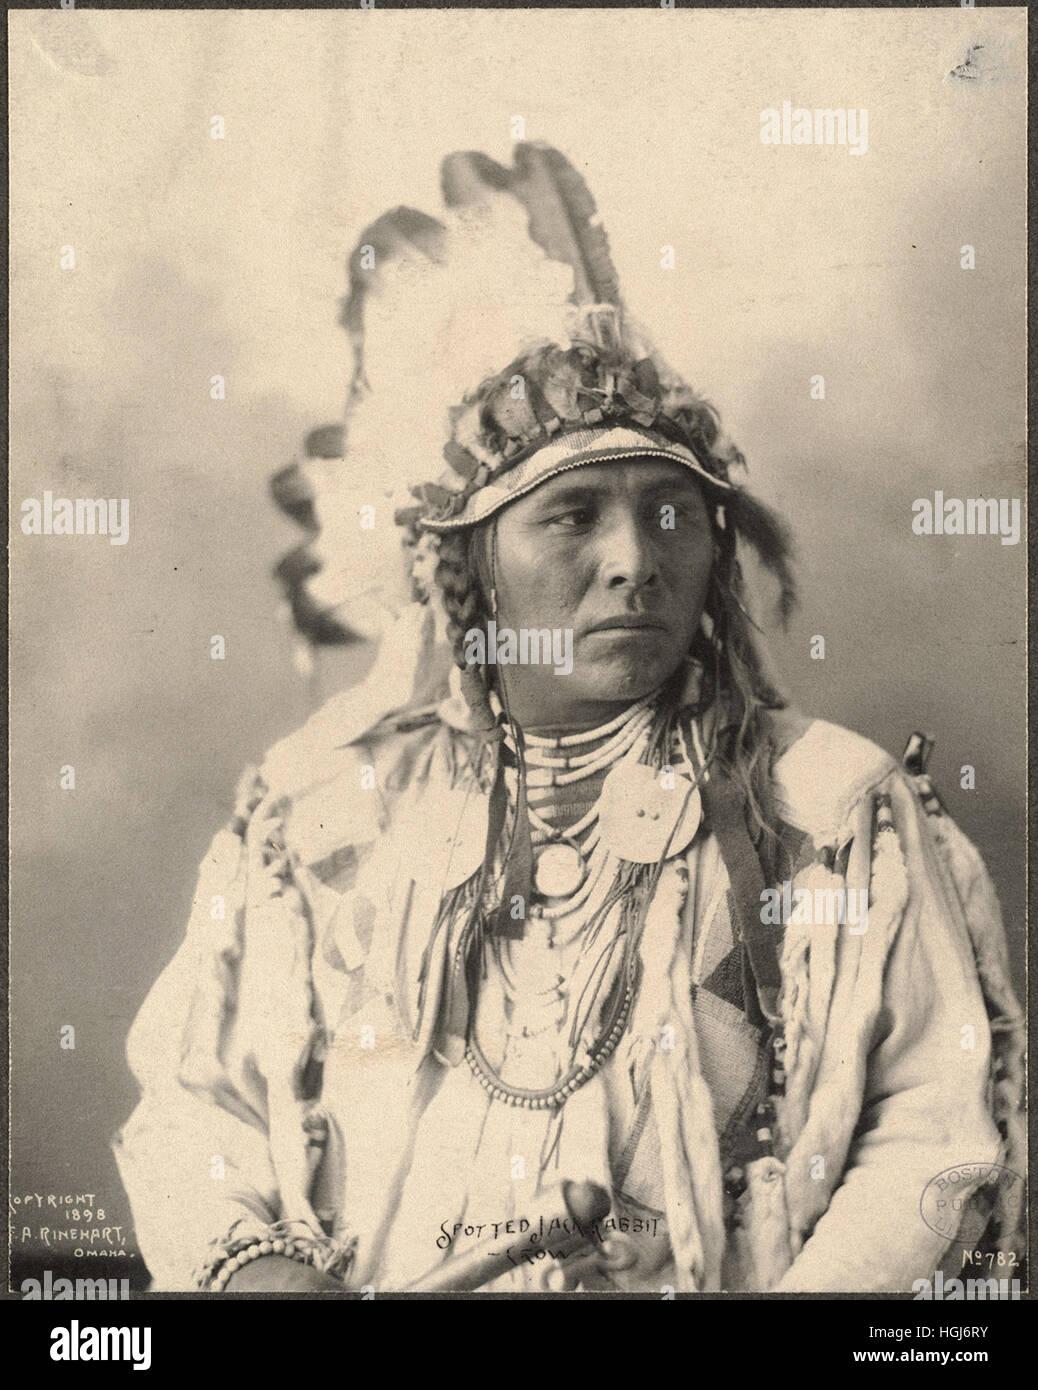 Spotted Jack Rabbit, Crow   - 1898 Indian Congress - Photo : Frank A. Rinehart - Stock Image